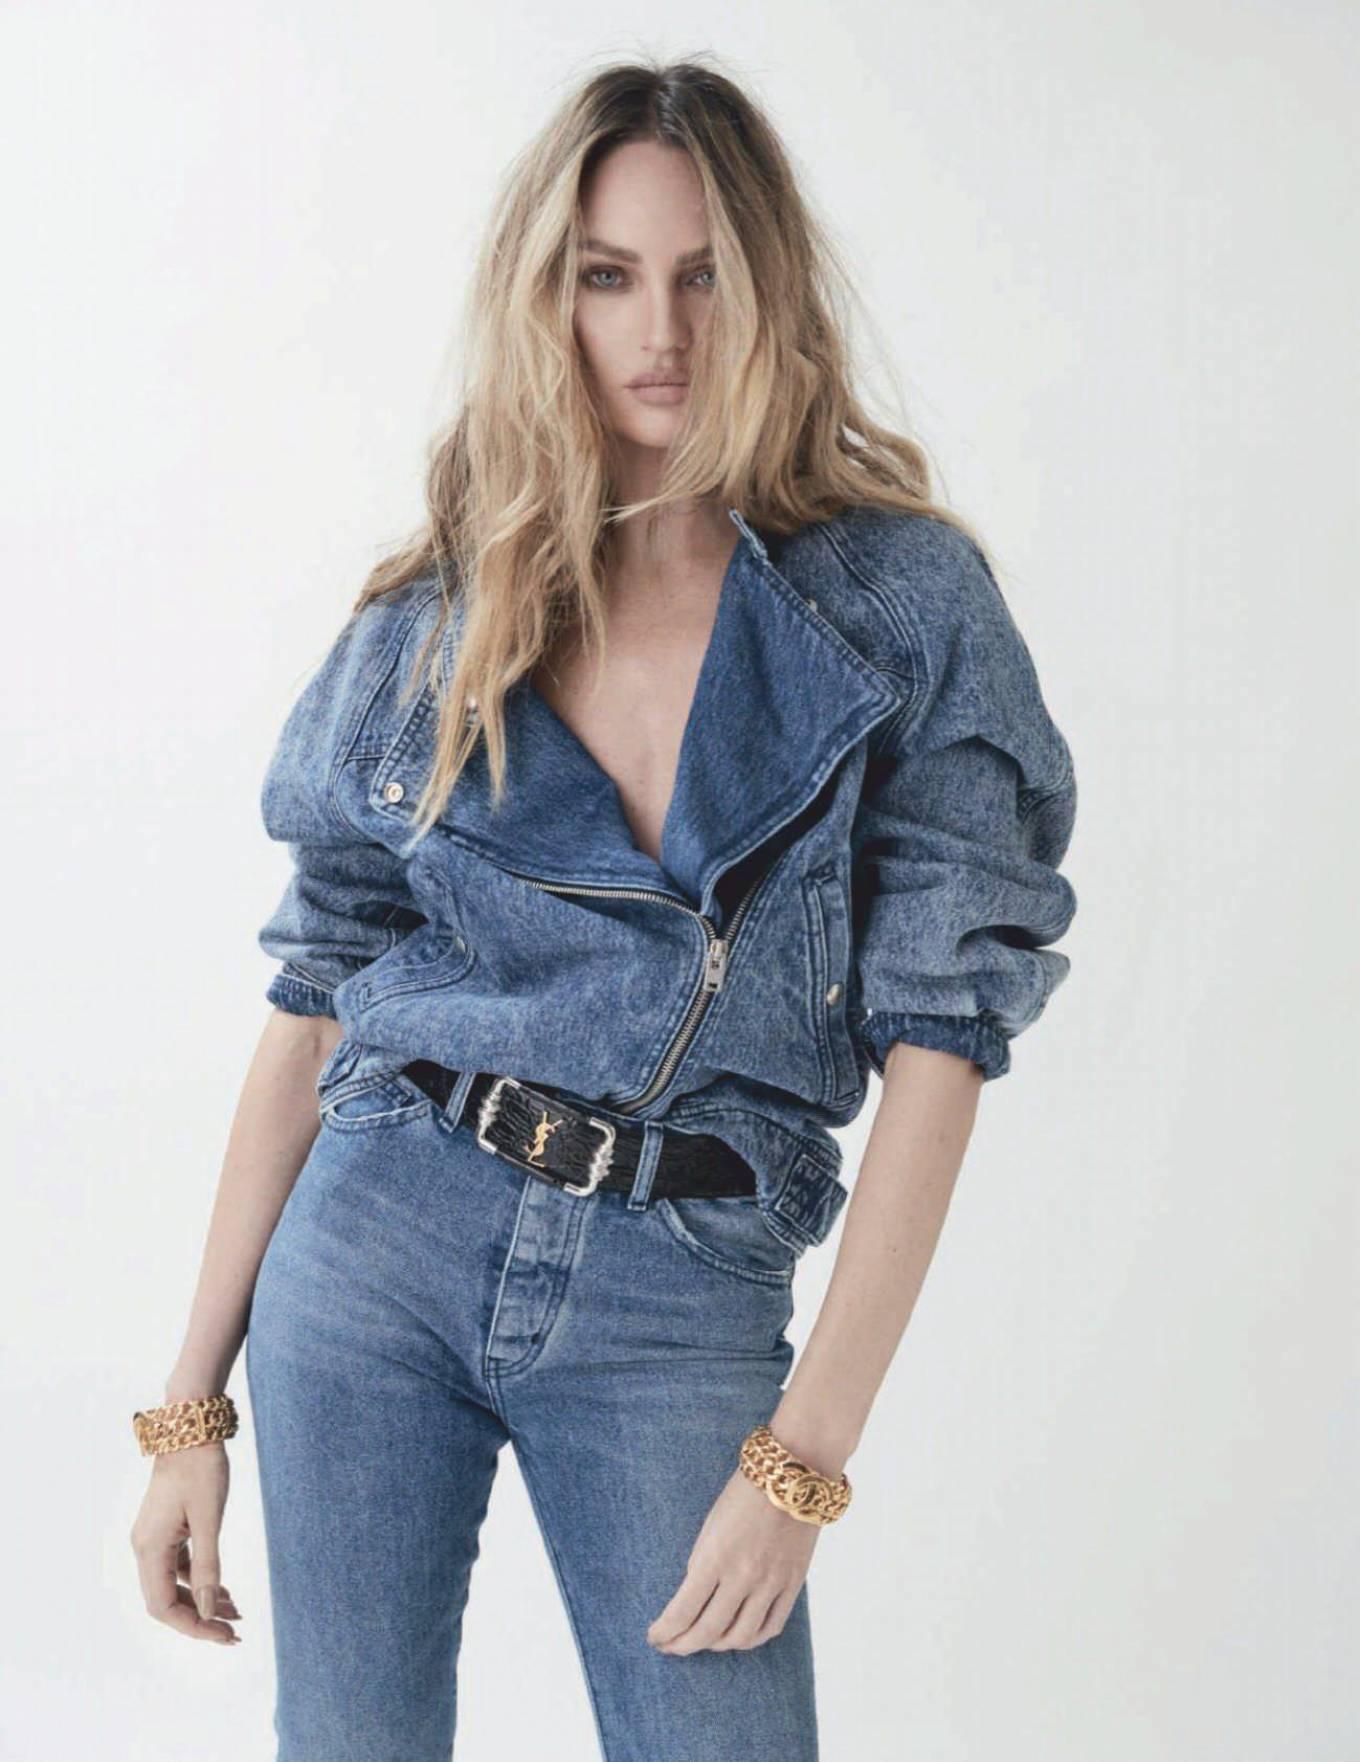 Candice Swanepoel 2020 : Candice Swanepoel – For Harpers Bazaar Magazine (Spain – October 2020 issue)-06